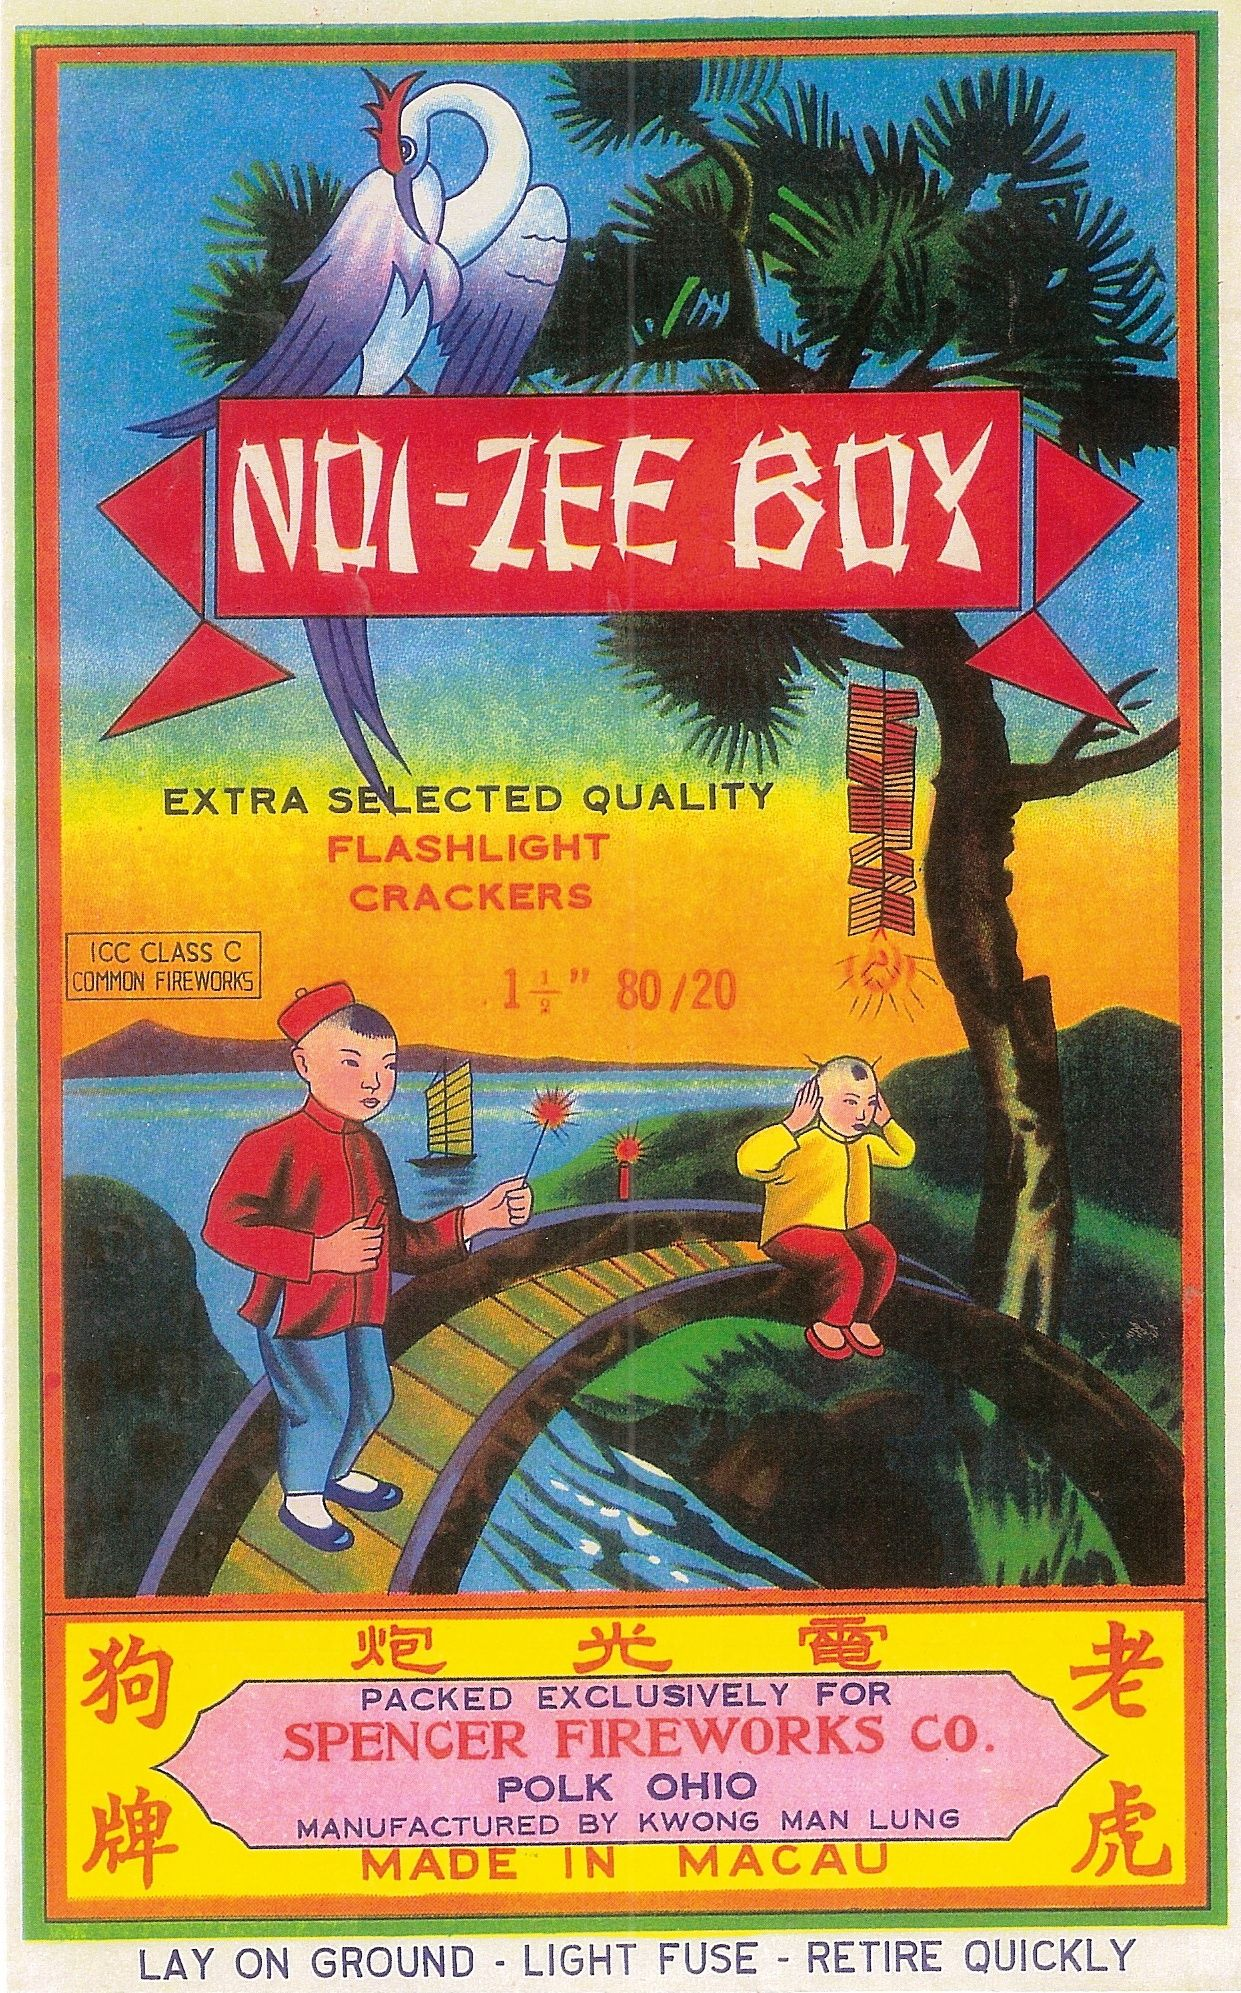 NOI-ZEE BOY Brand Firecracker Label Illustration